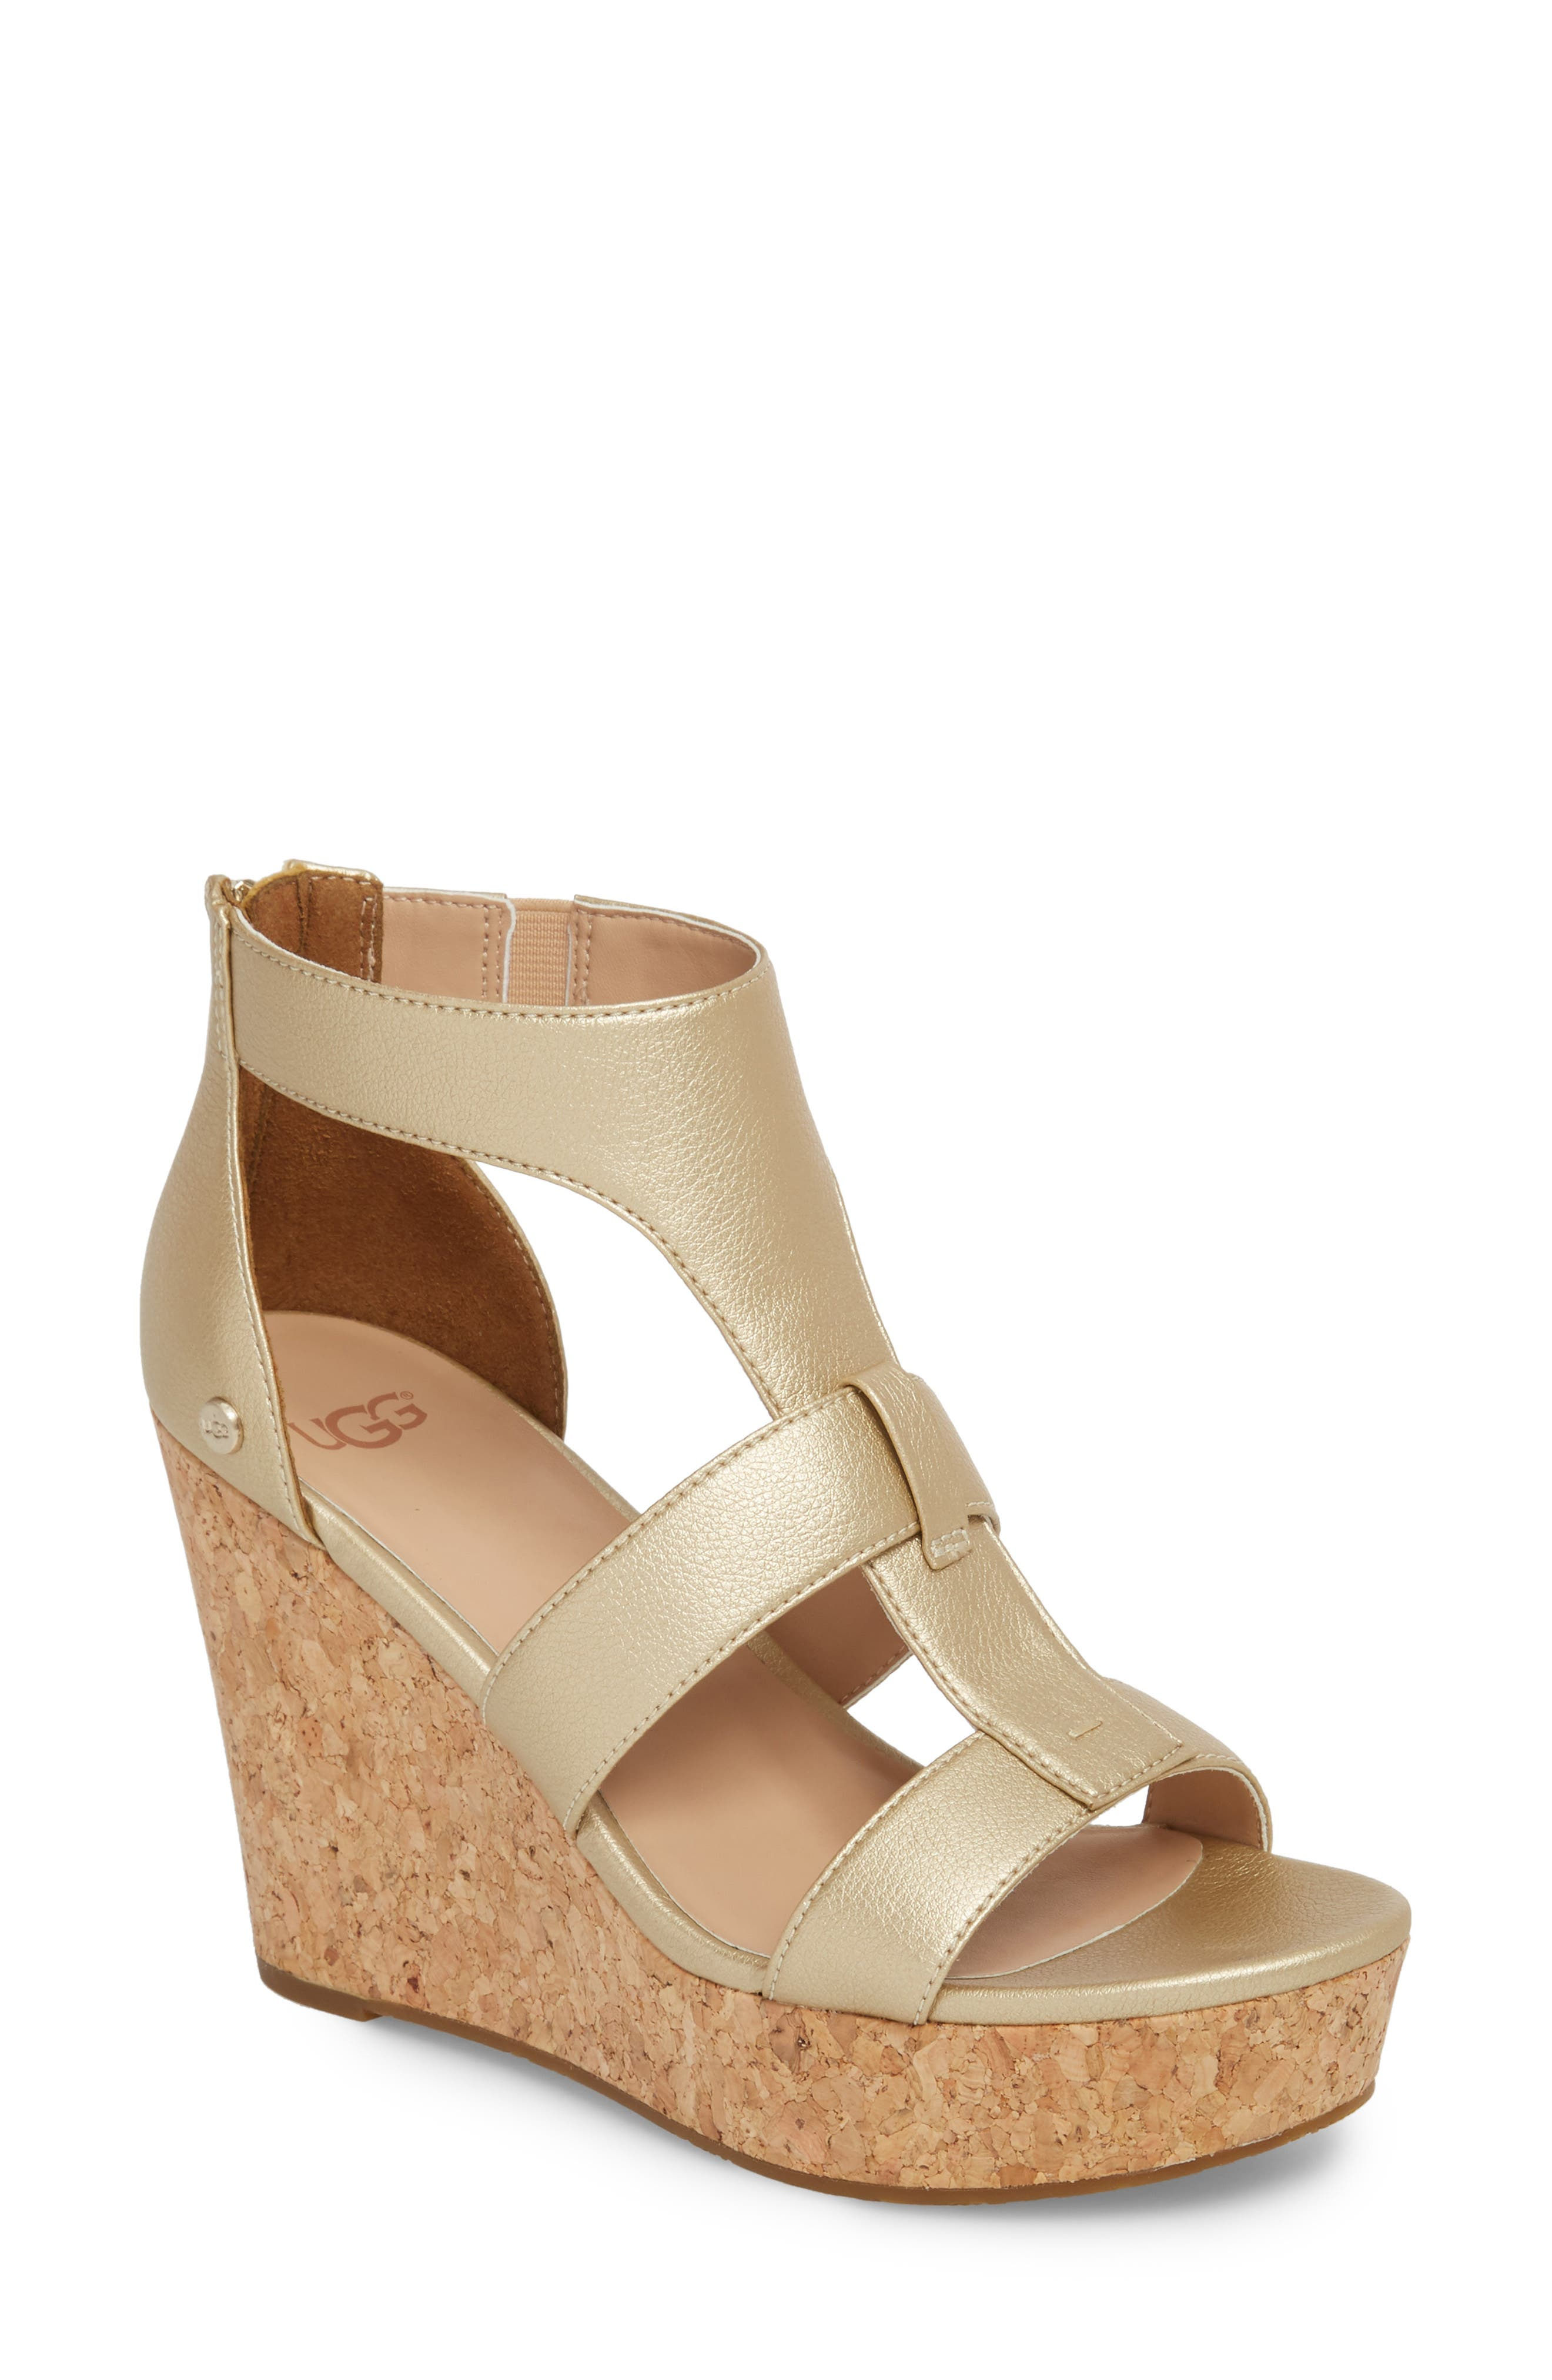 Whitney Platform Wedge Sandal,                             Main thumbnail 1, color,                             Gold Leather